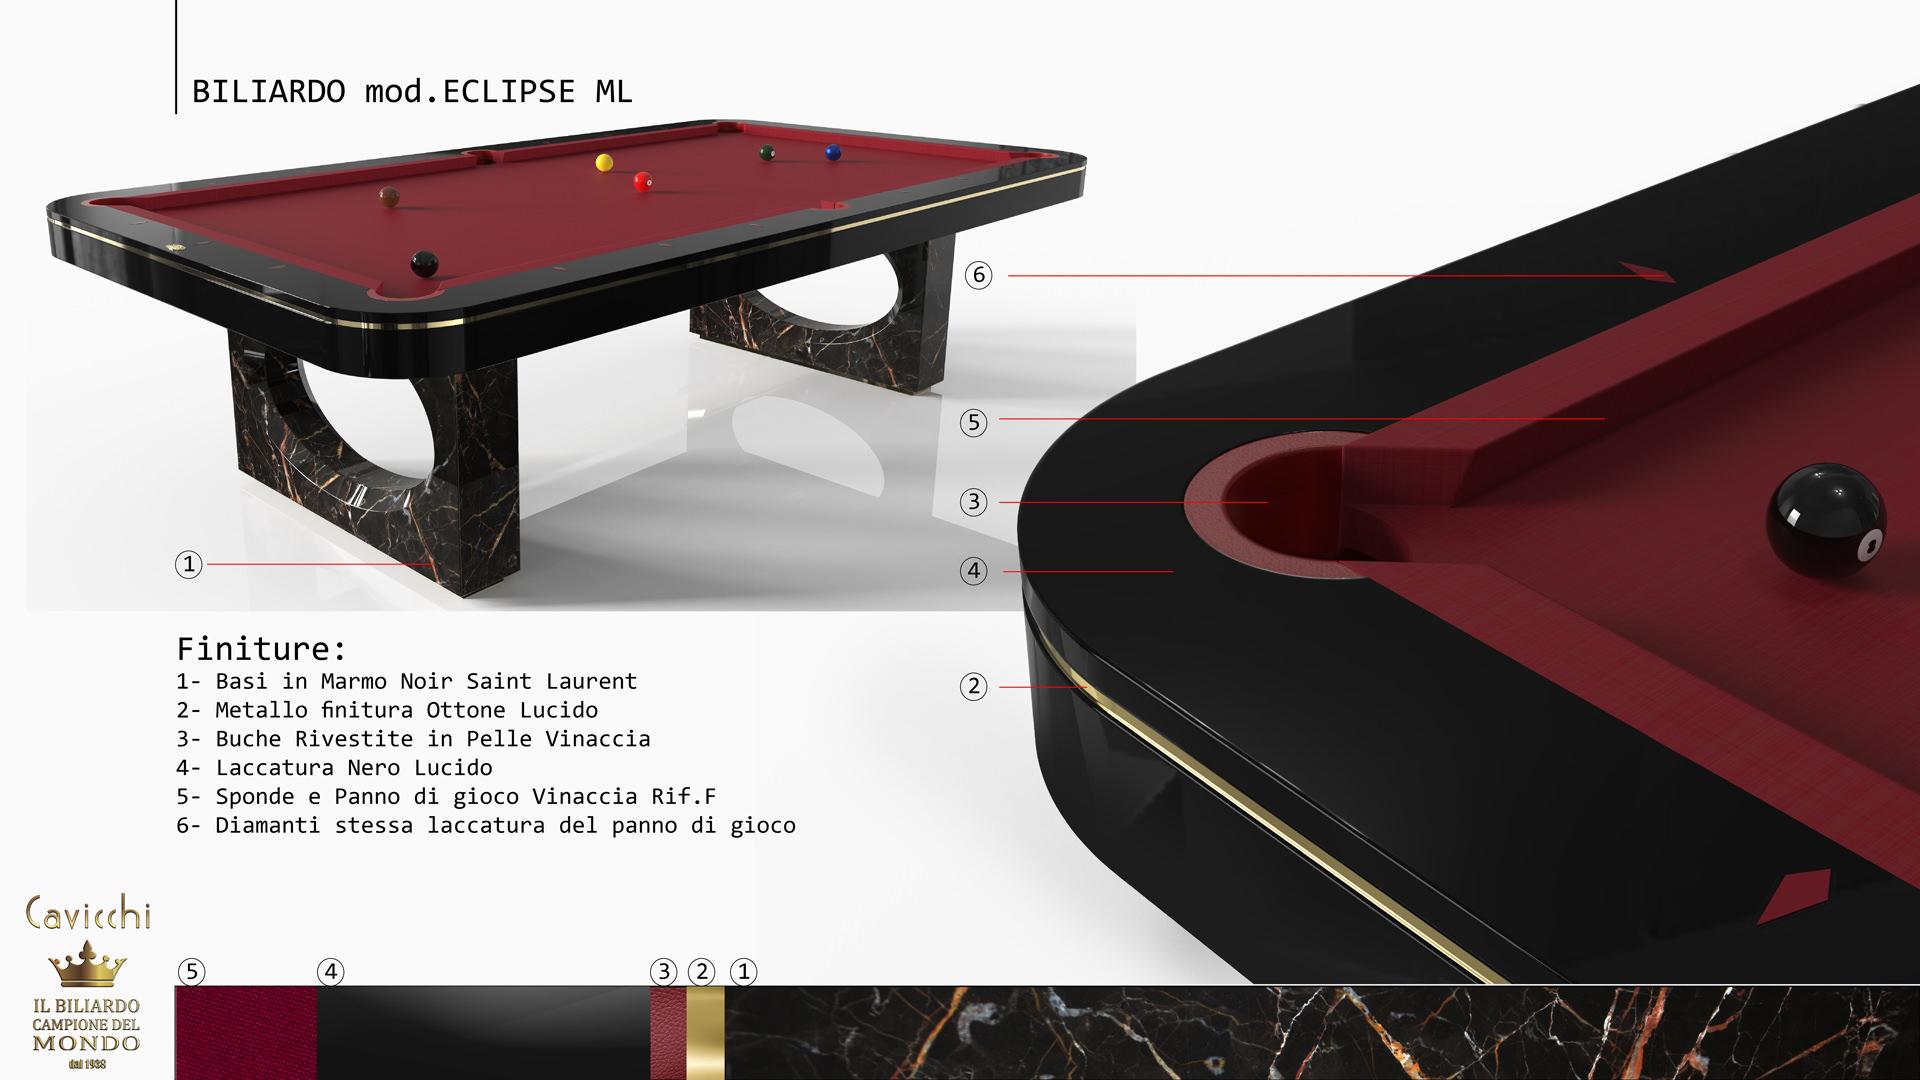 ECLIPSE BILLIARD POOL TABLE 5